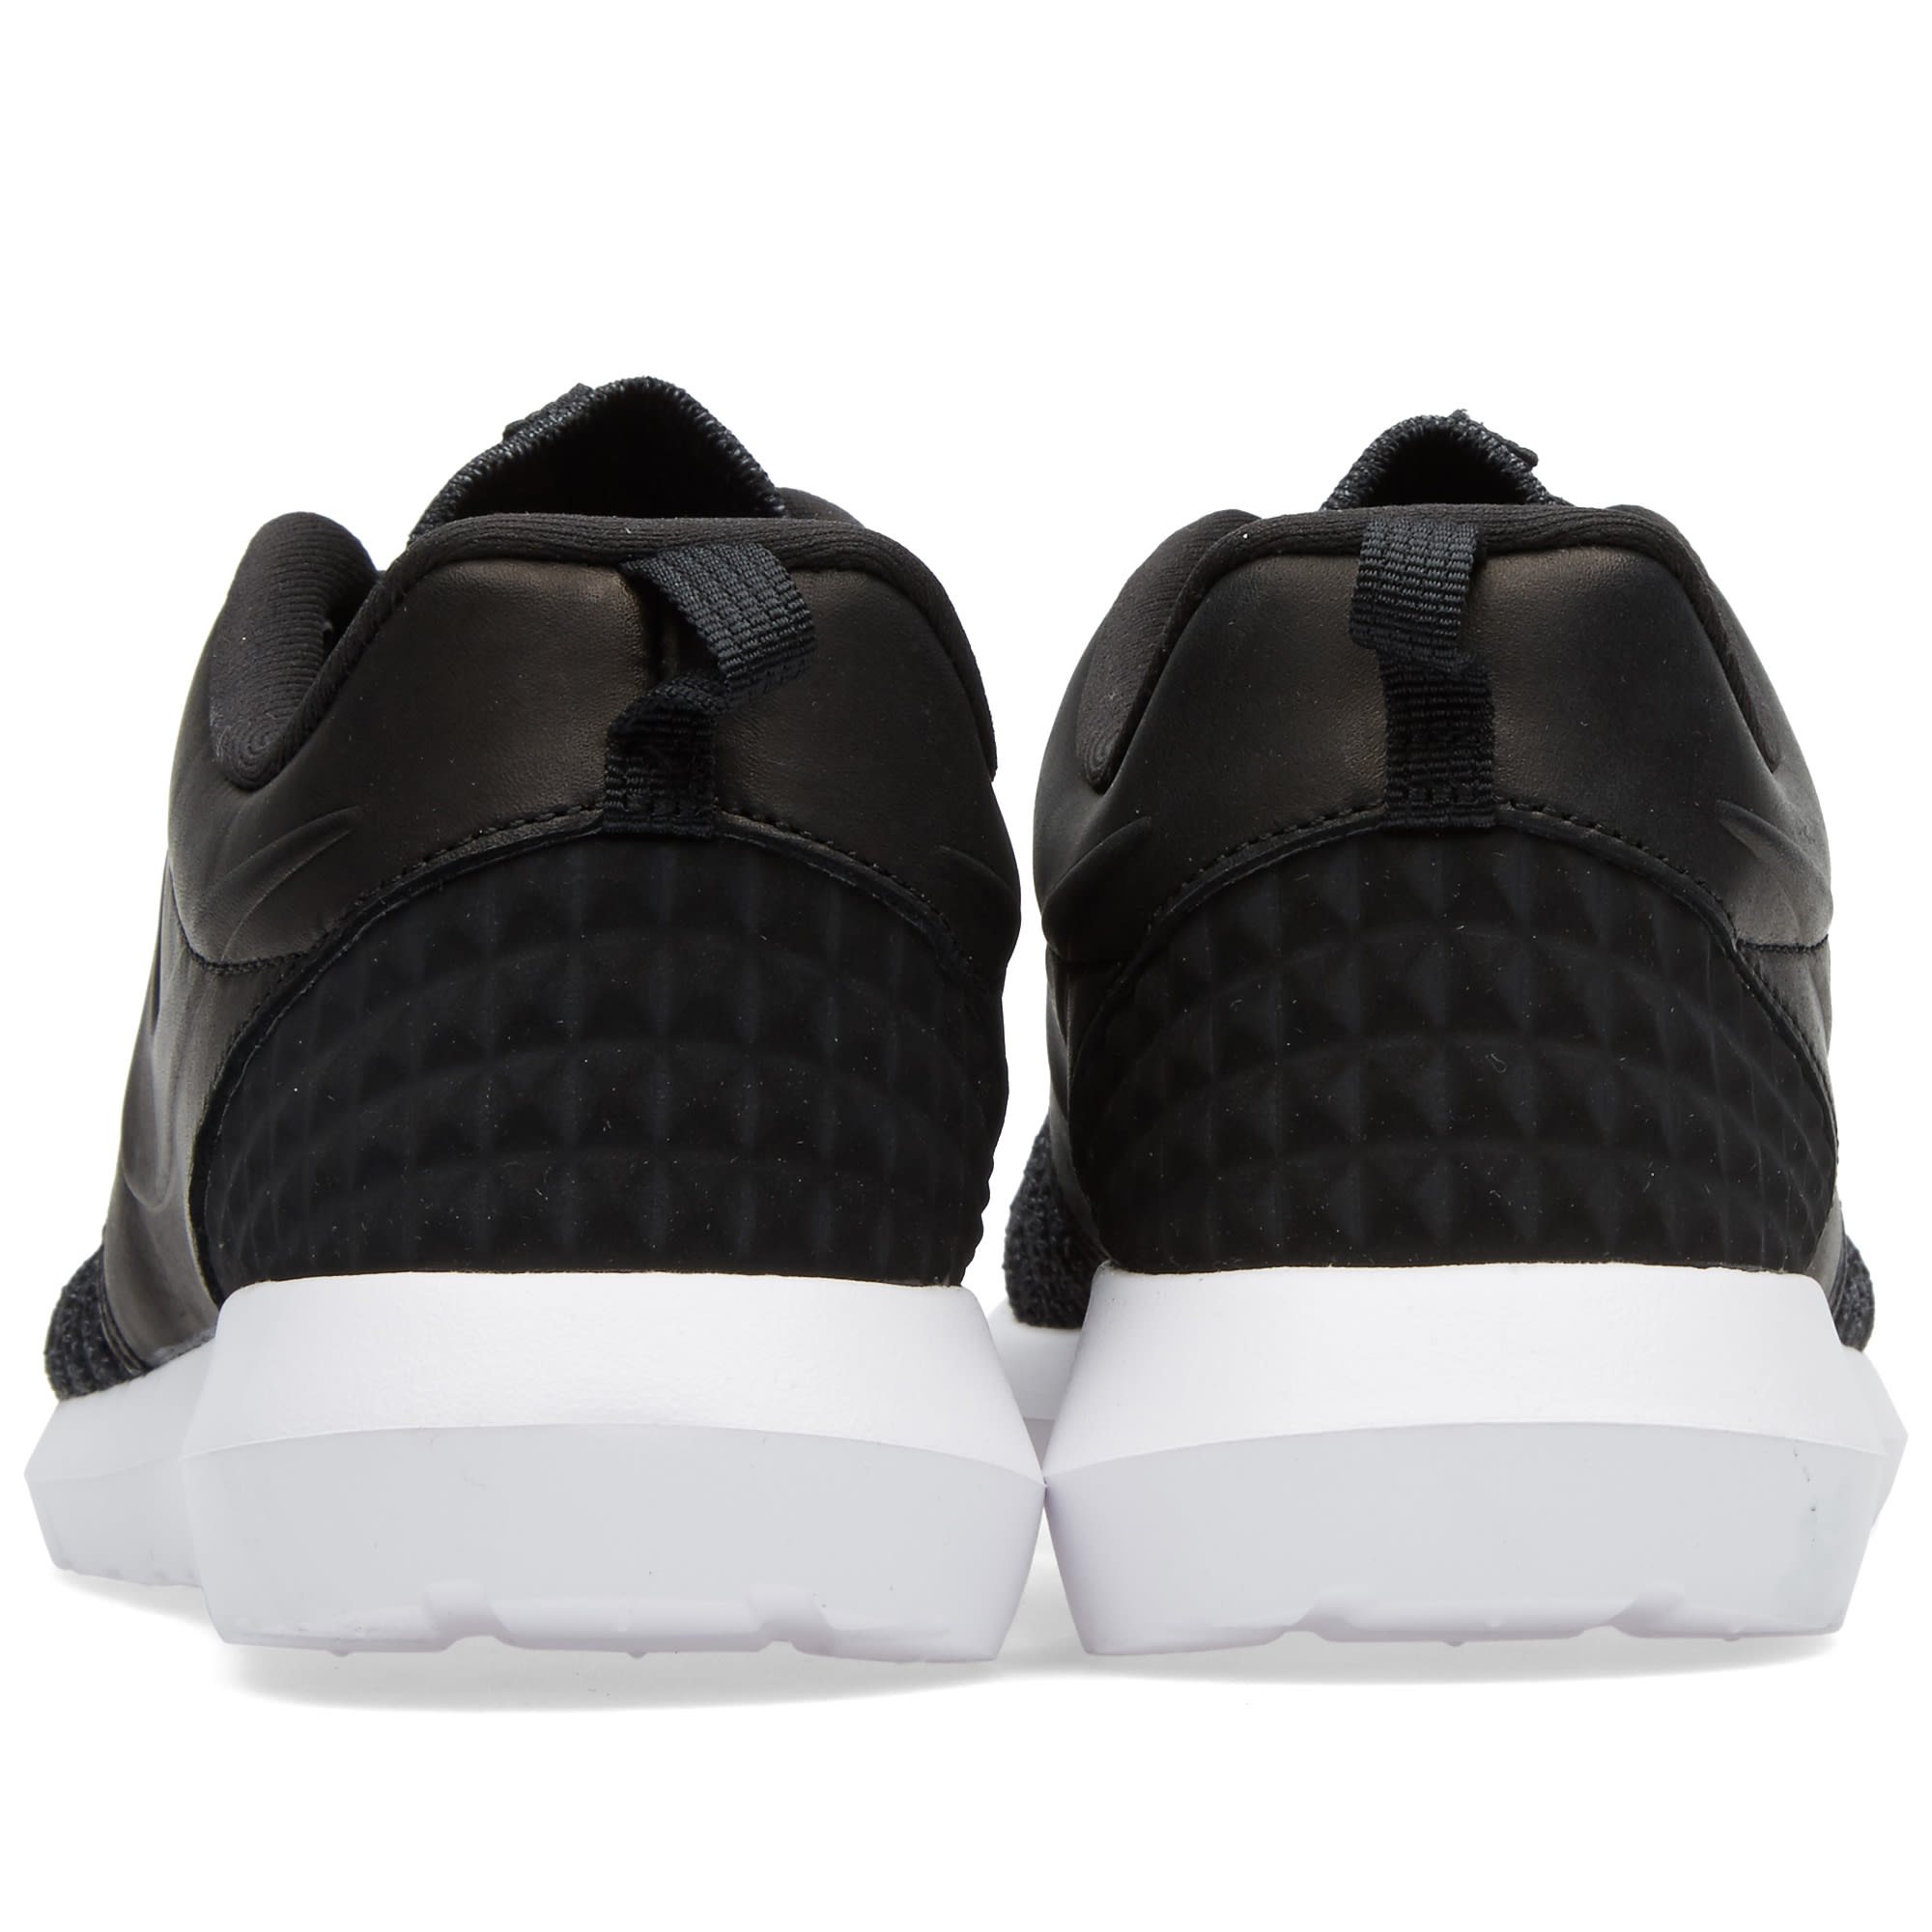 166fbf3762bf Nike Roshe One NM Flyknit Premium Black